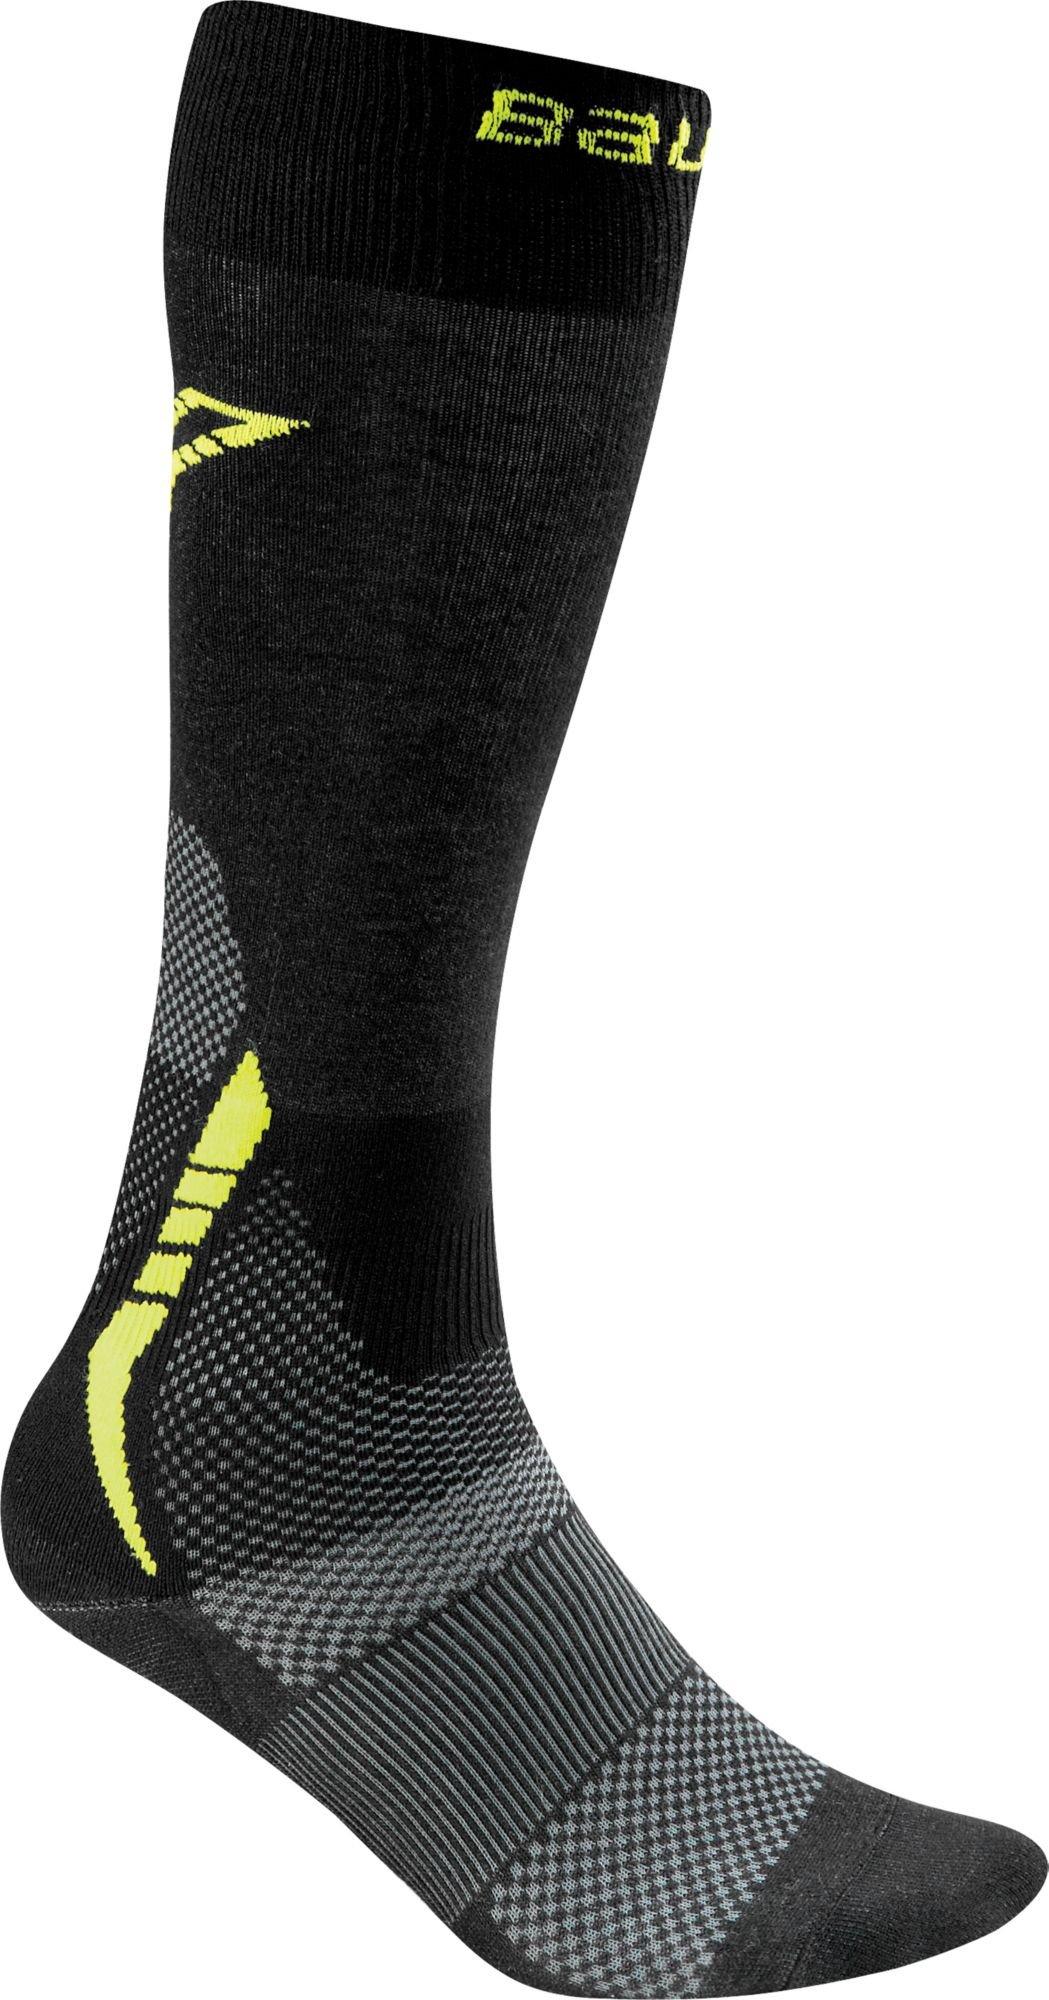 Bauer Premium Tall Hockey Skate Socks - Black, XL